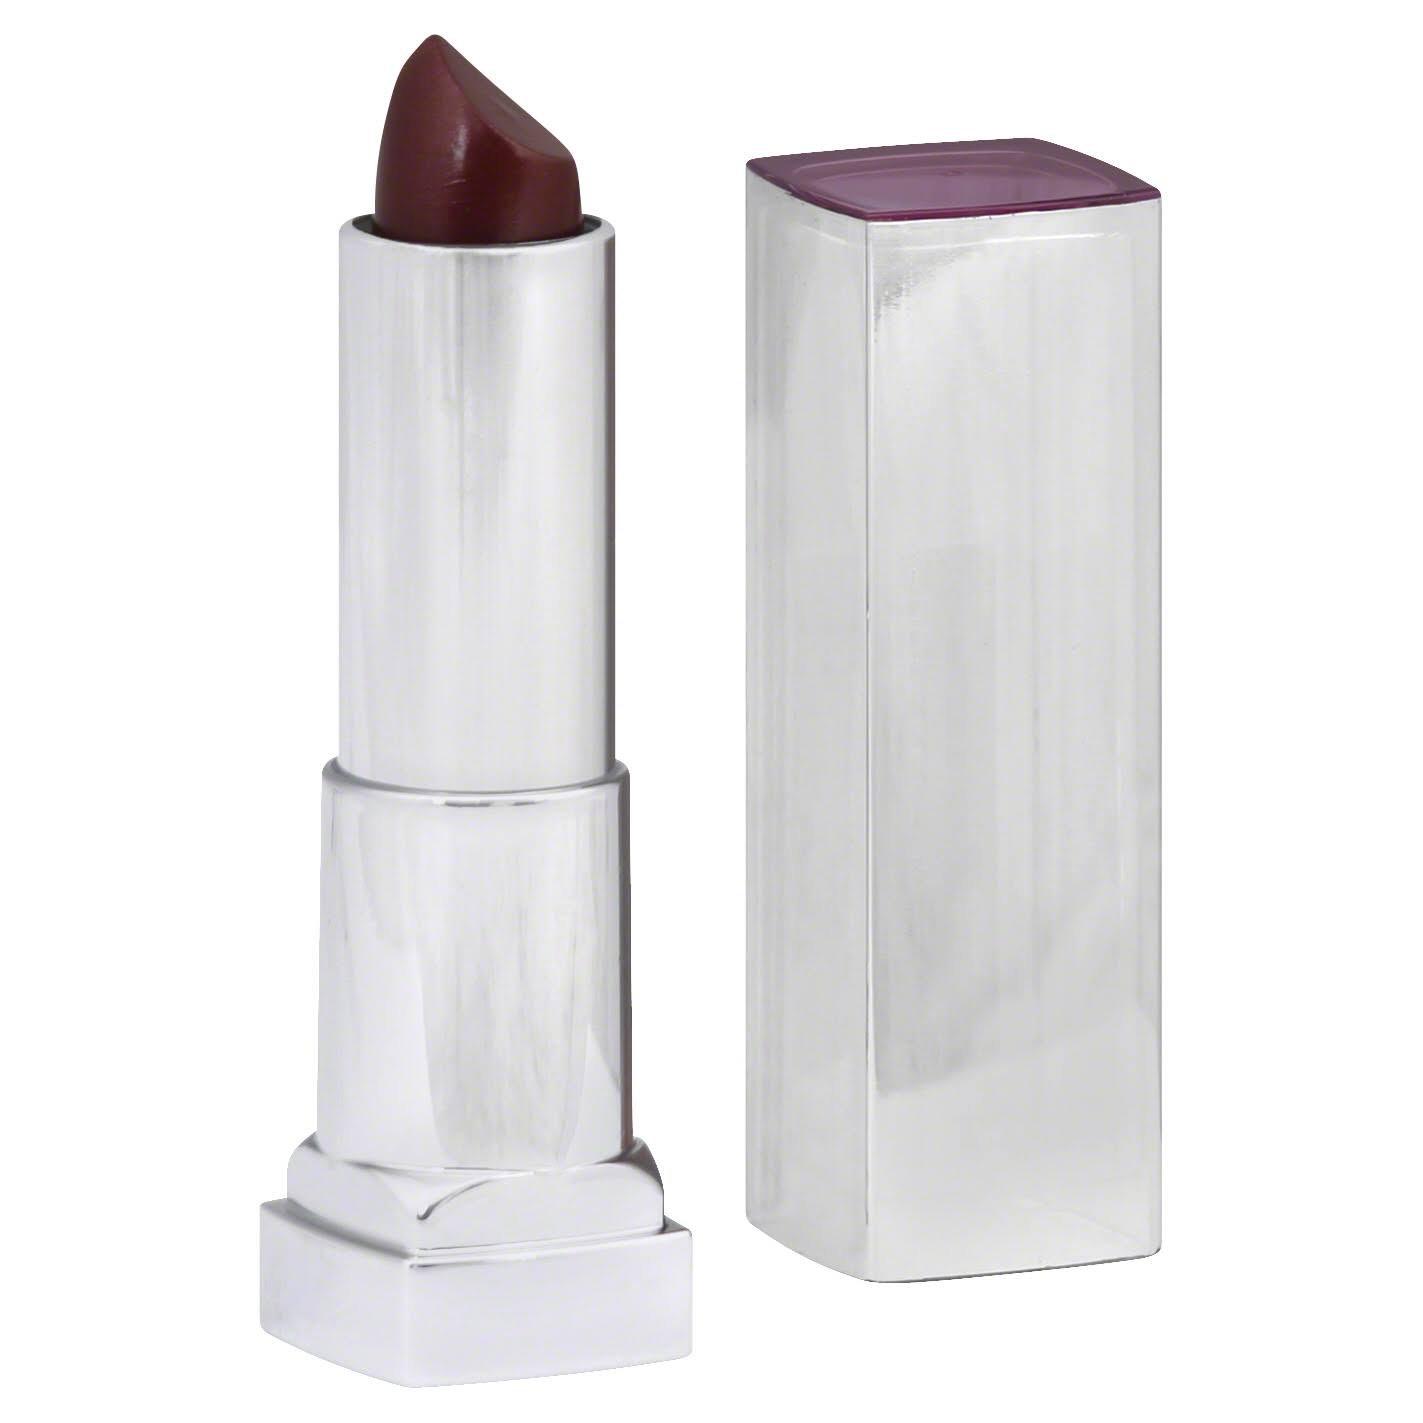 Maybelline New York Colorsensational Lipstick, Dazzling Plum 835 - 0.12 oz